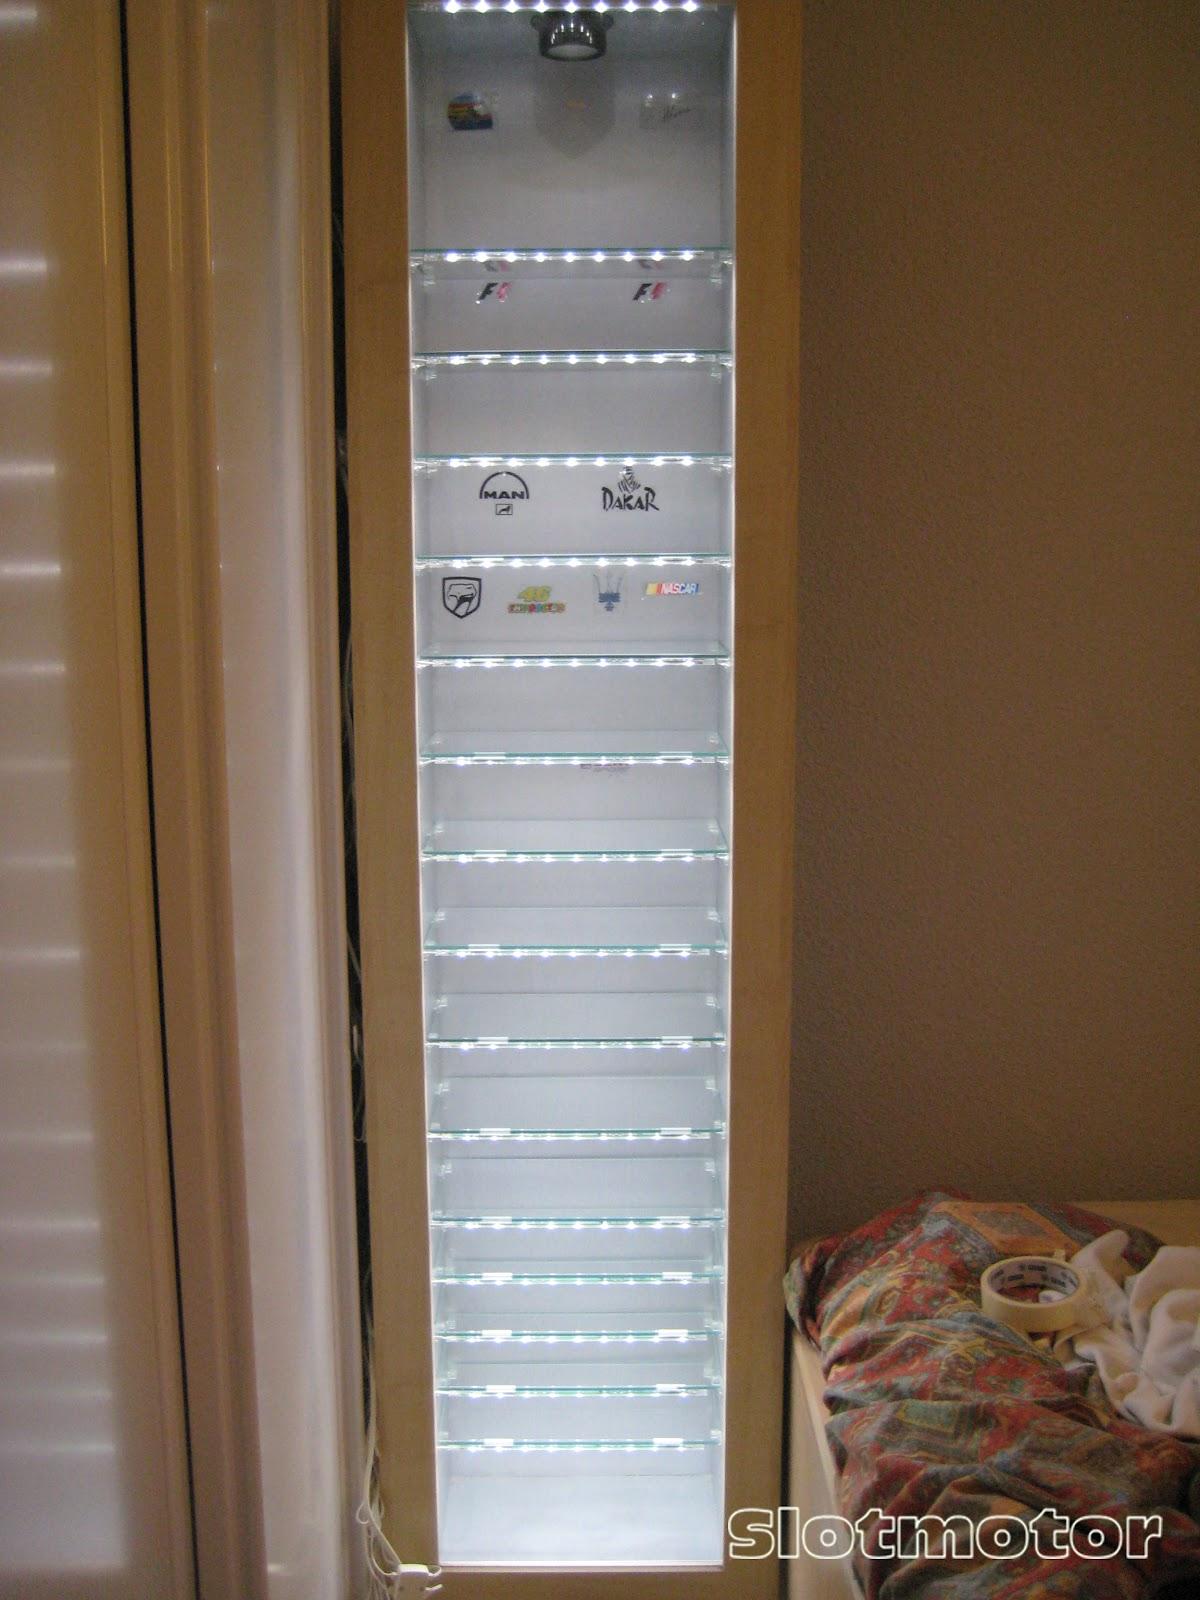 ... Vitrina a Vitrinu00f3n - Iluminando mi vitrina Ikea Bertby - Pasiu00f3n Slot